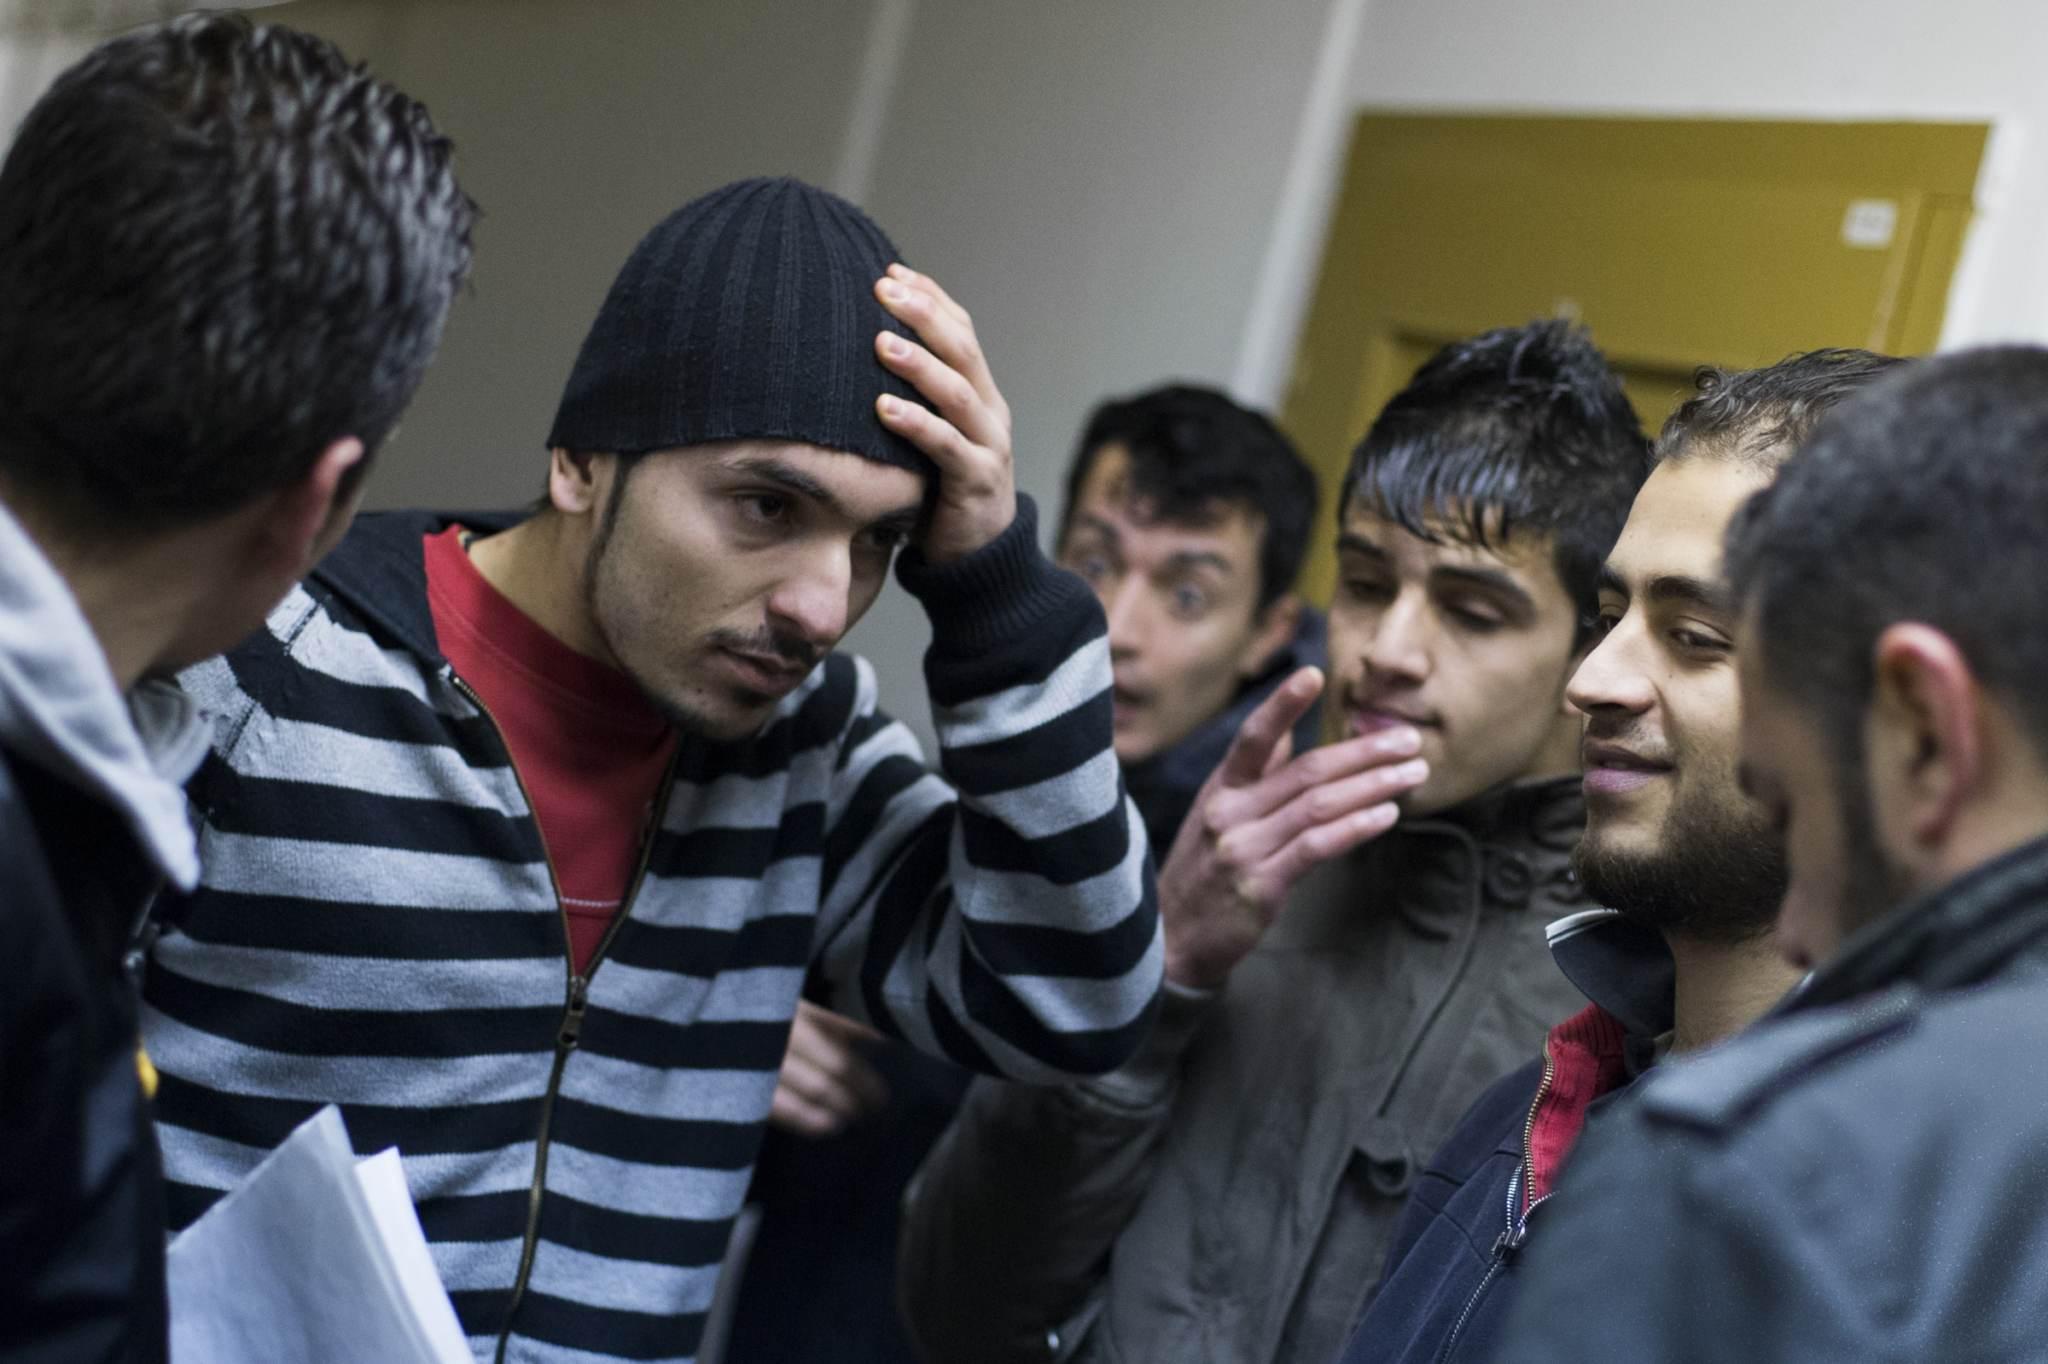 Süürlastest asüülitaotlejad Berliinis vestlusringis. Foto: Thomas Peter, Reuters/Scanpix